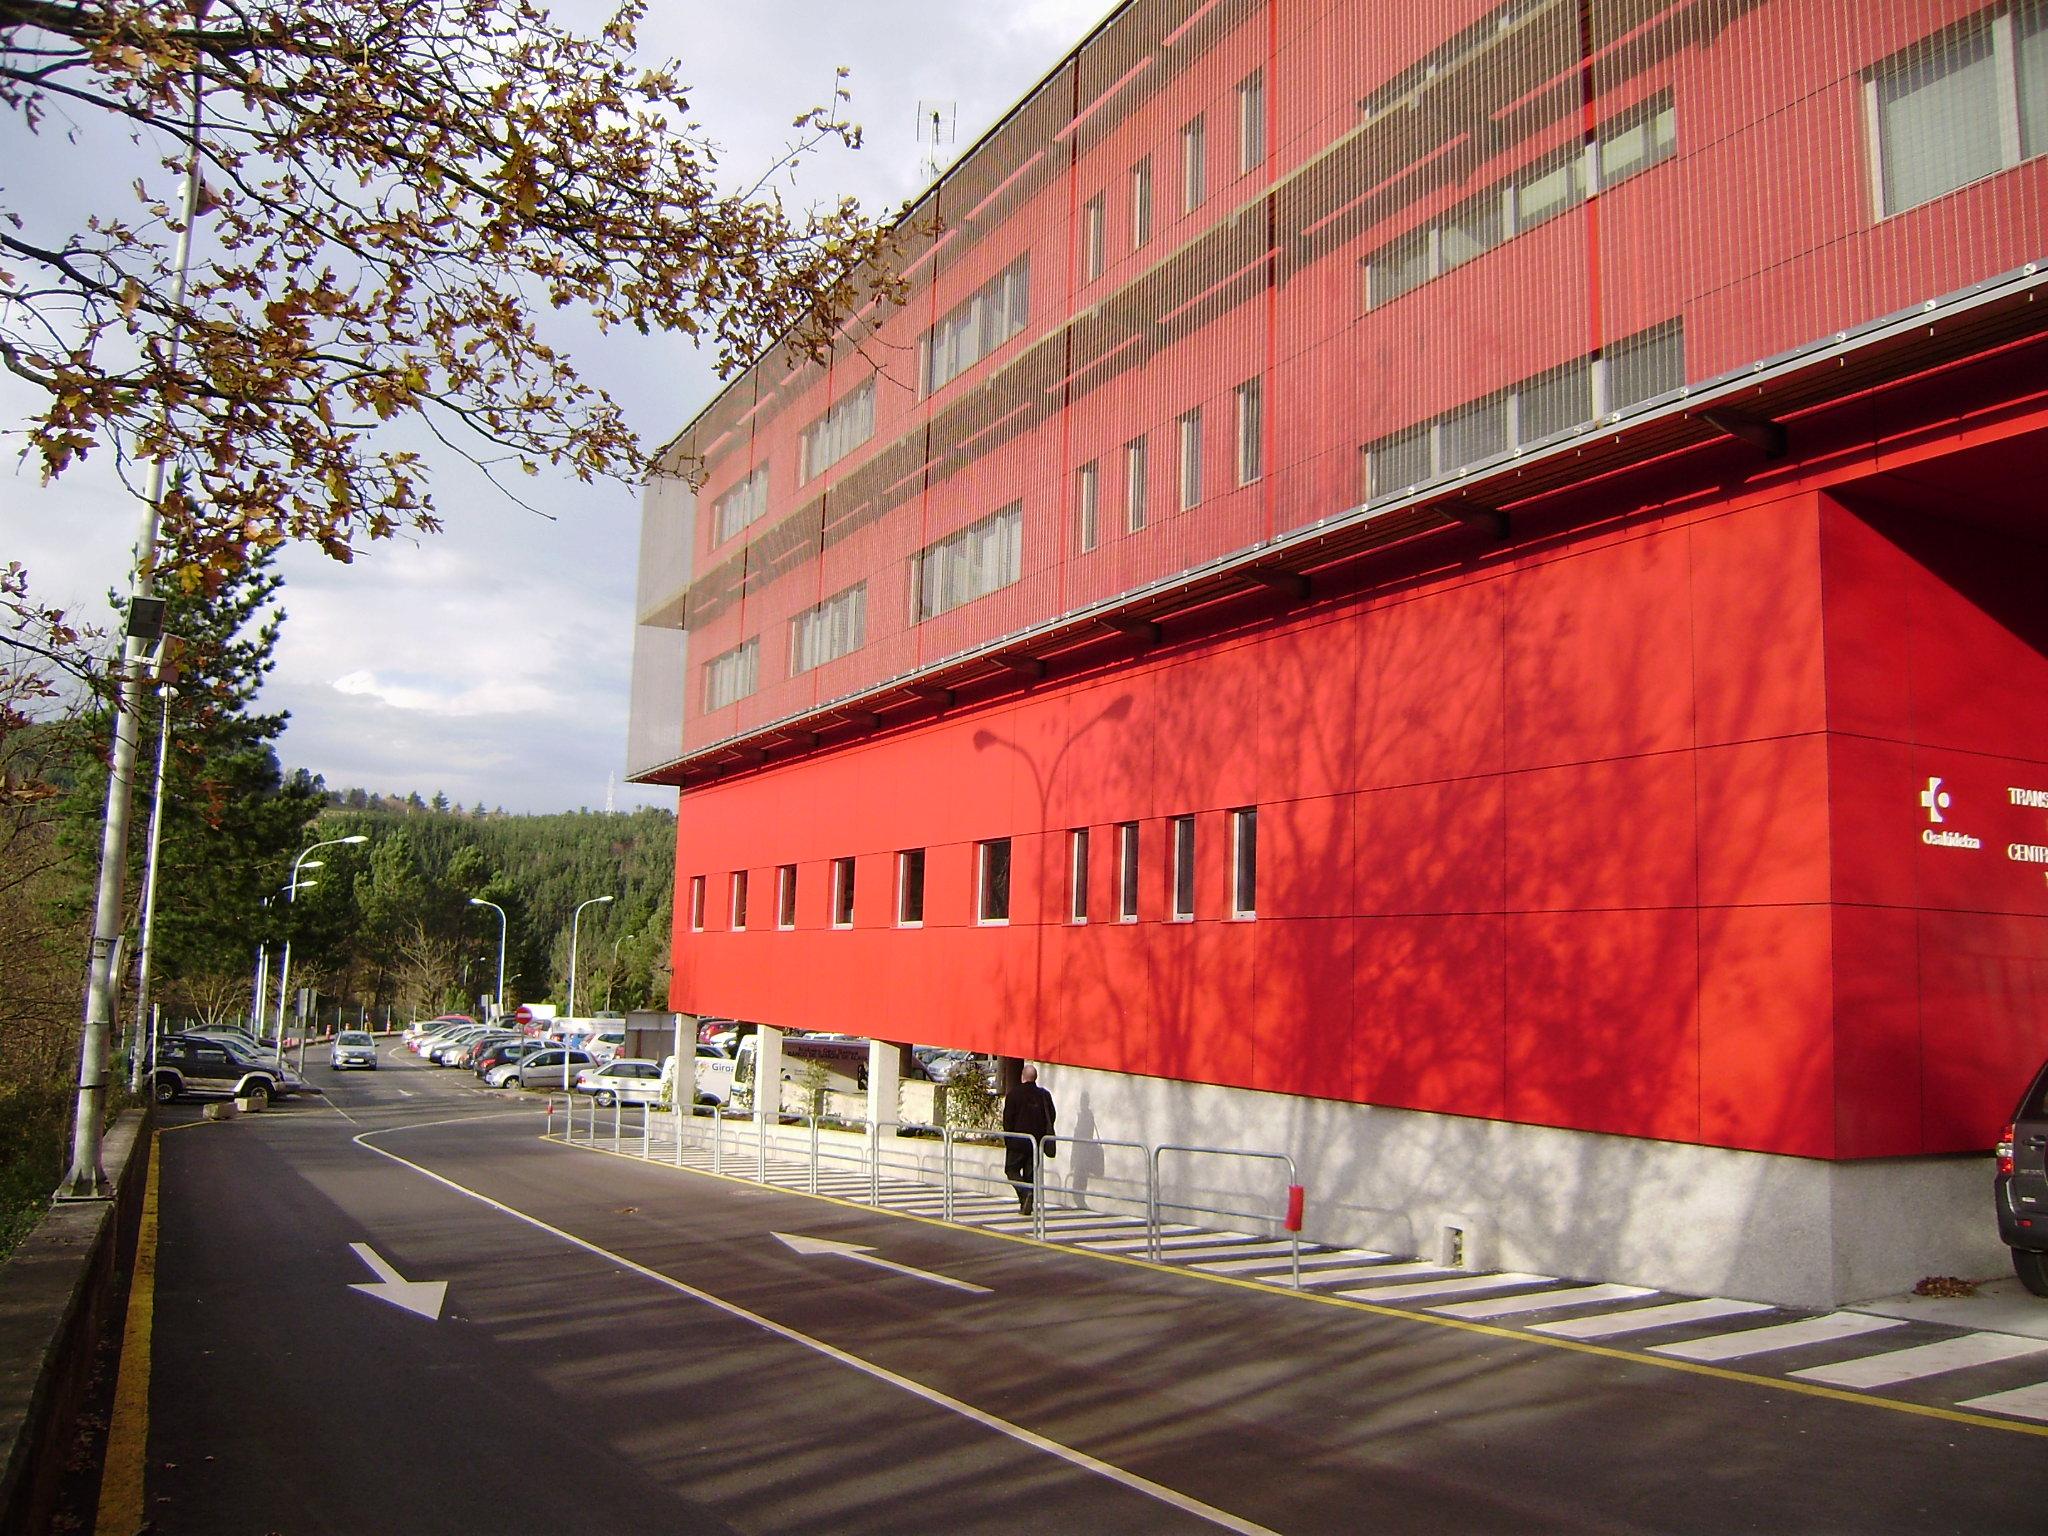 40 vpo en bilbao la vieja estudio k - Estudios arquitectura bilbao ...